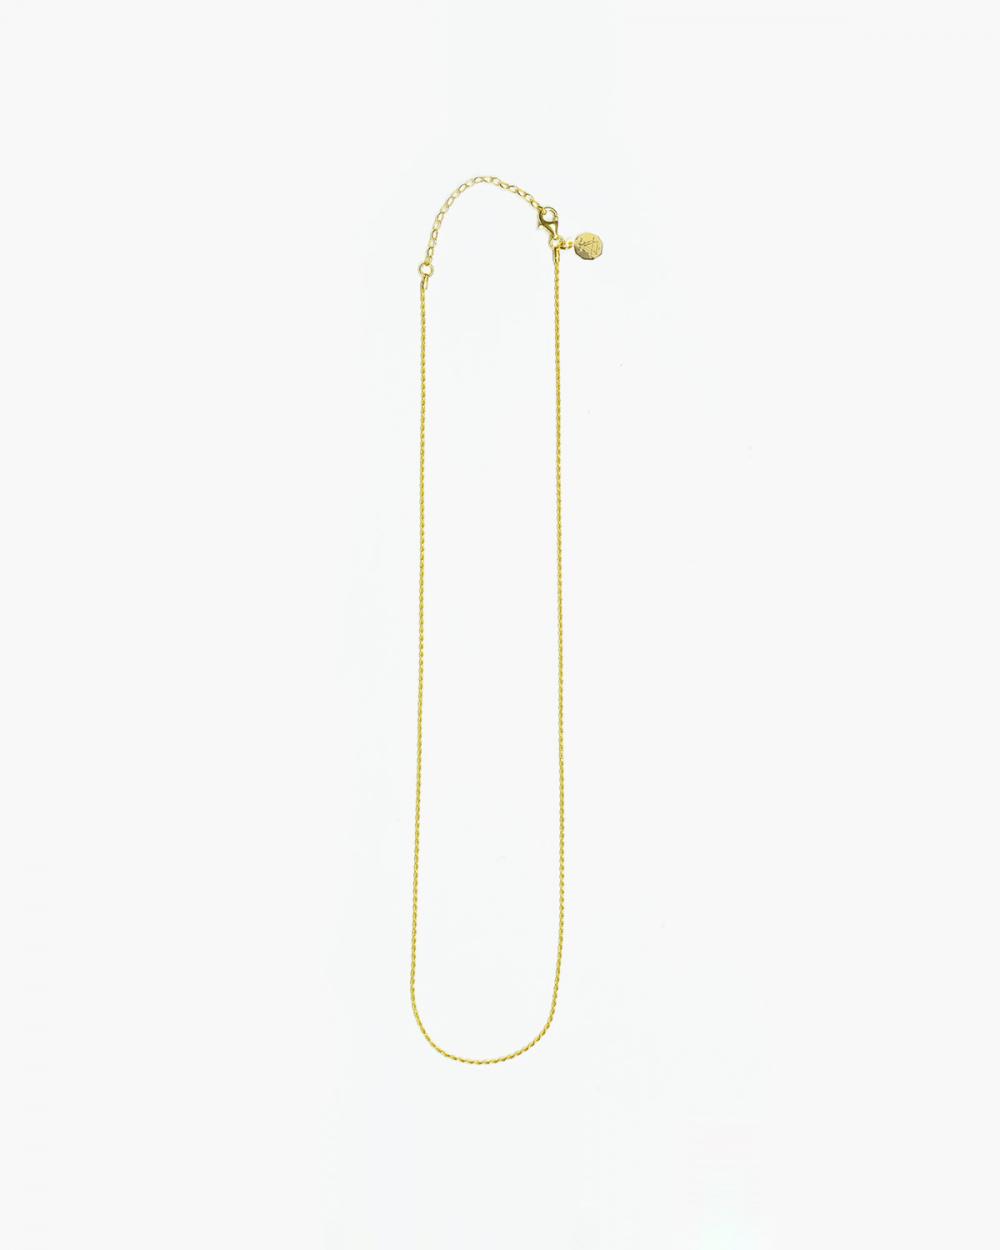 Necklaces YELLOW GOLD DIAMOND TORCHON CHAIN 025 NOVE25